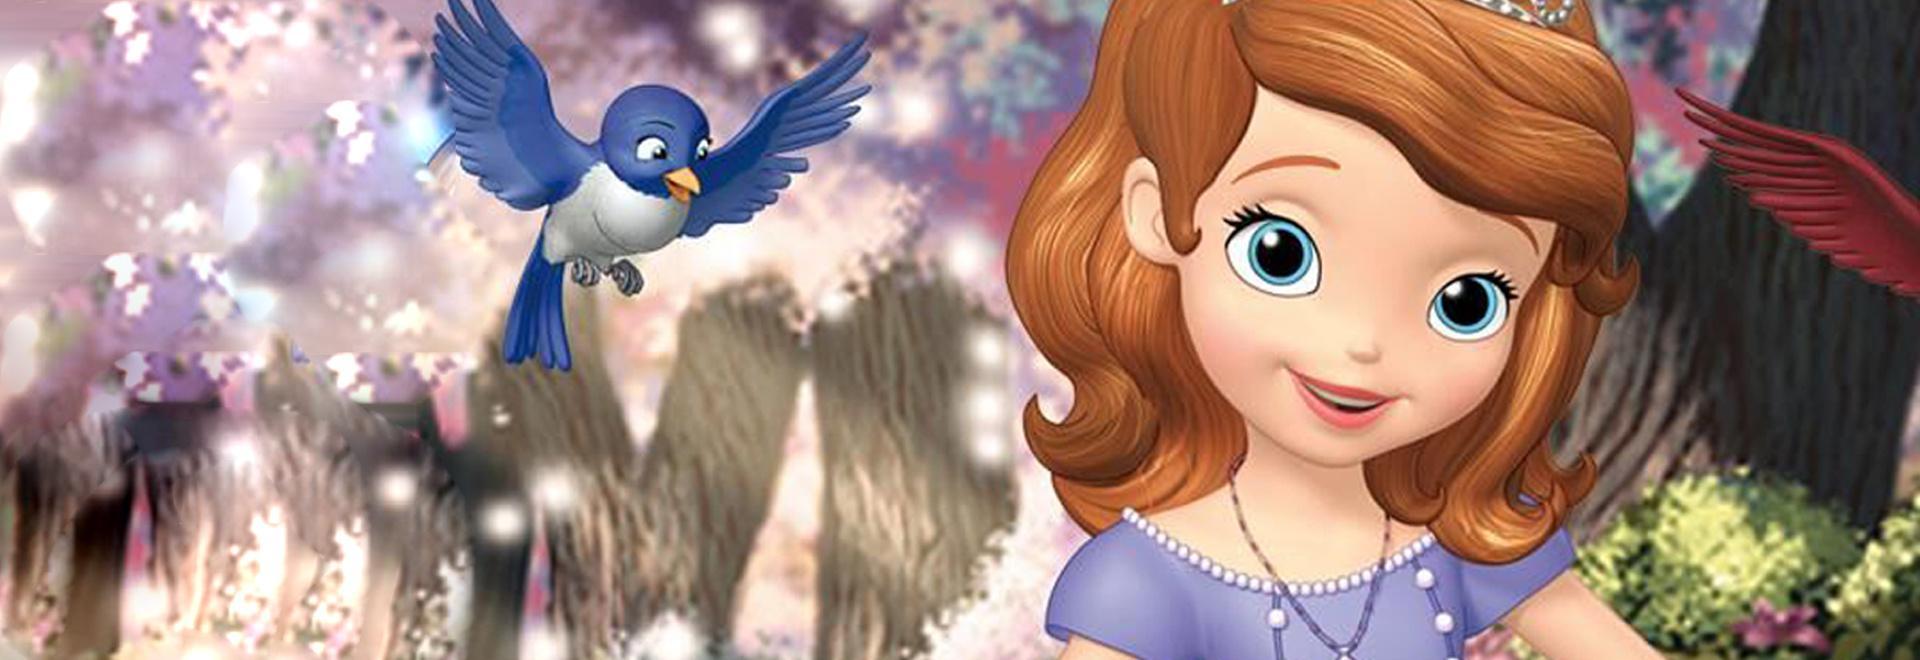 La principessa prodigio